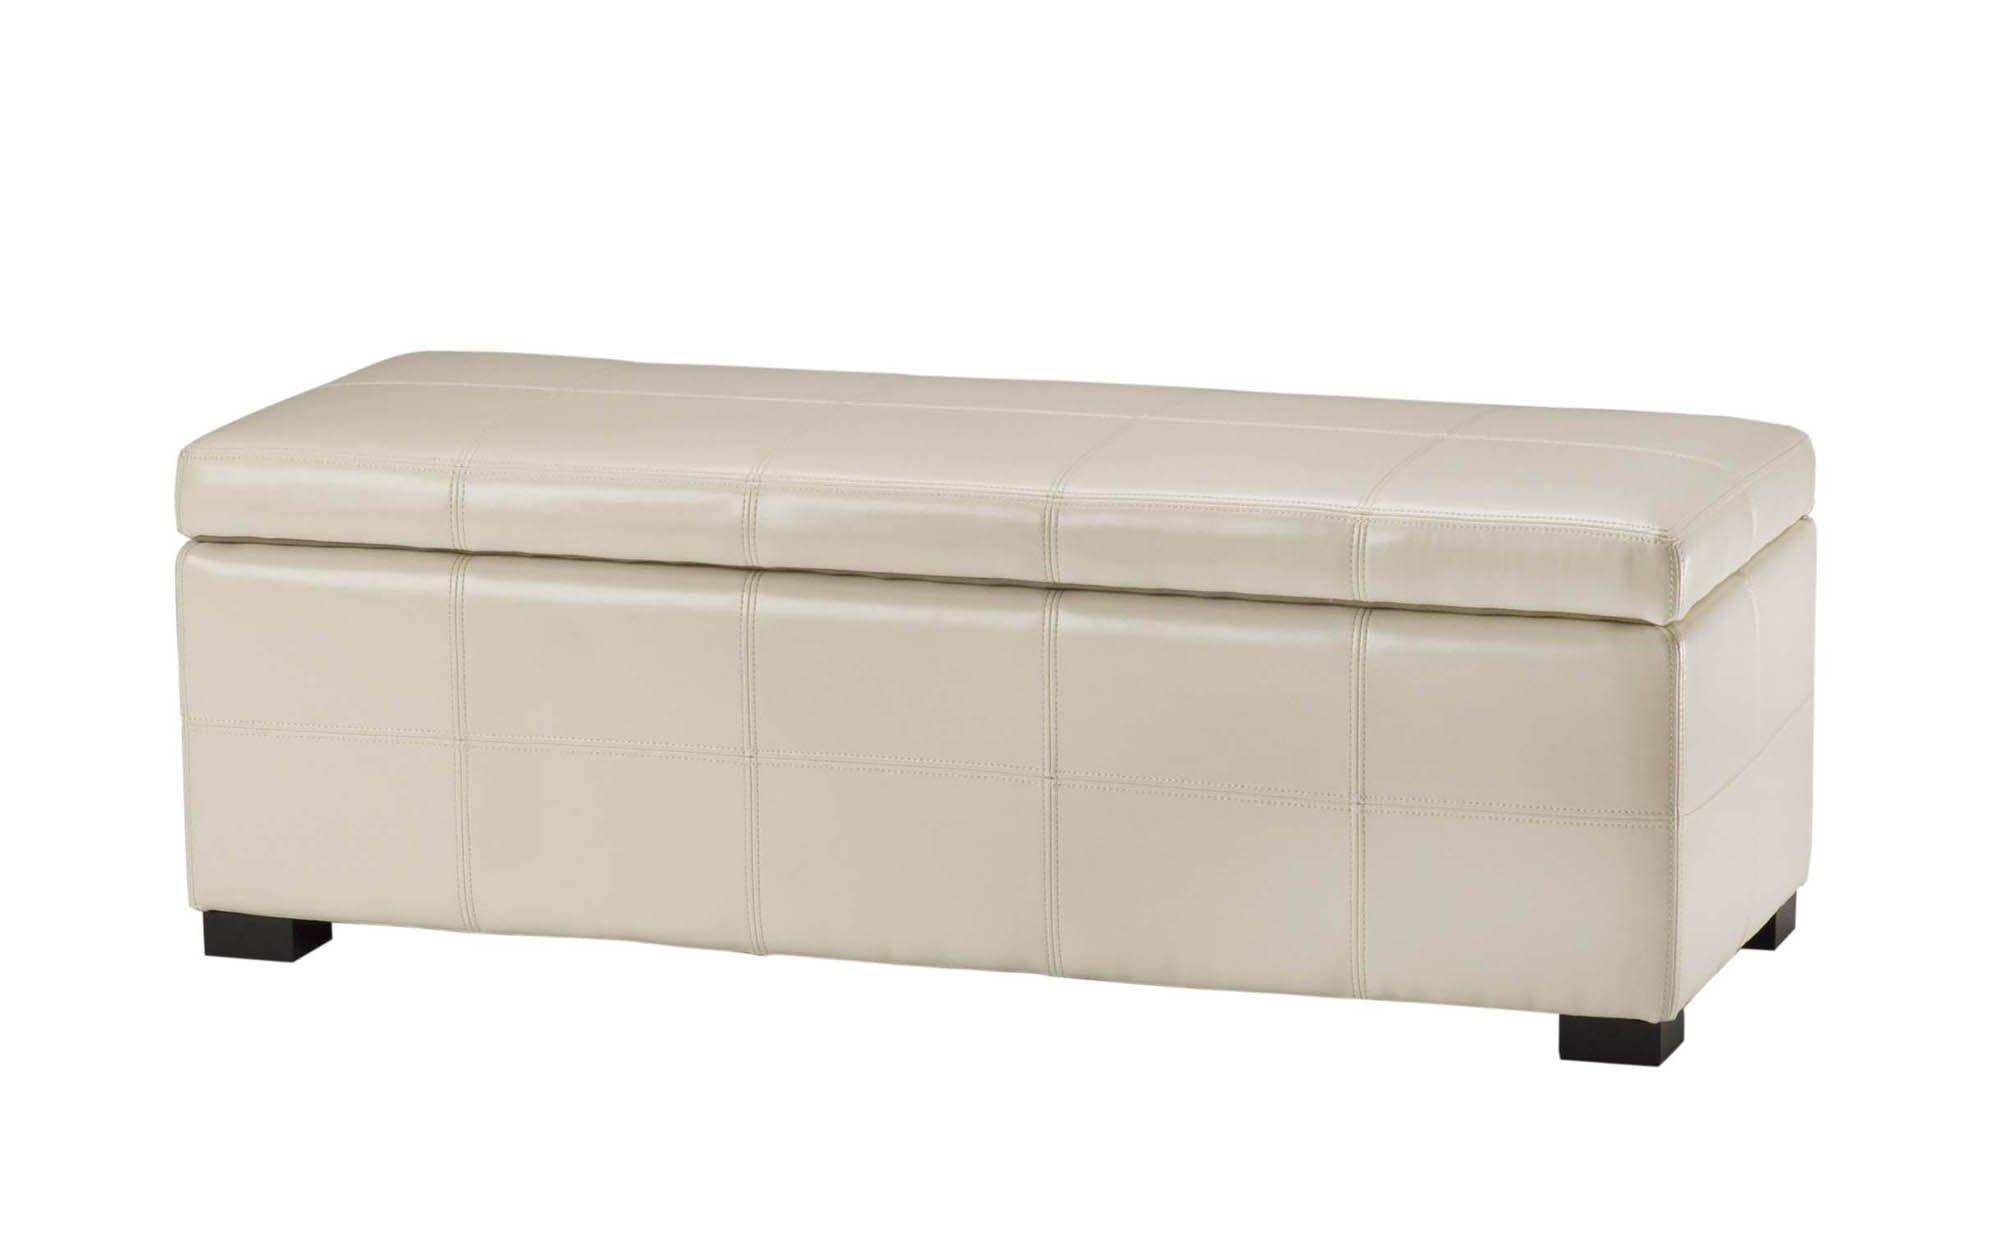 Safavieh Hudson Collection Williamsburg Brown Leather Large Storage Bench